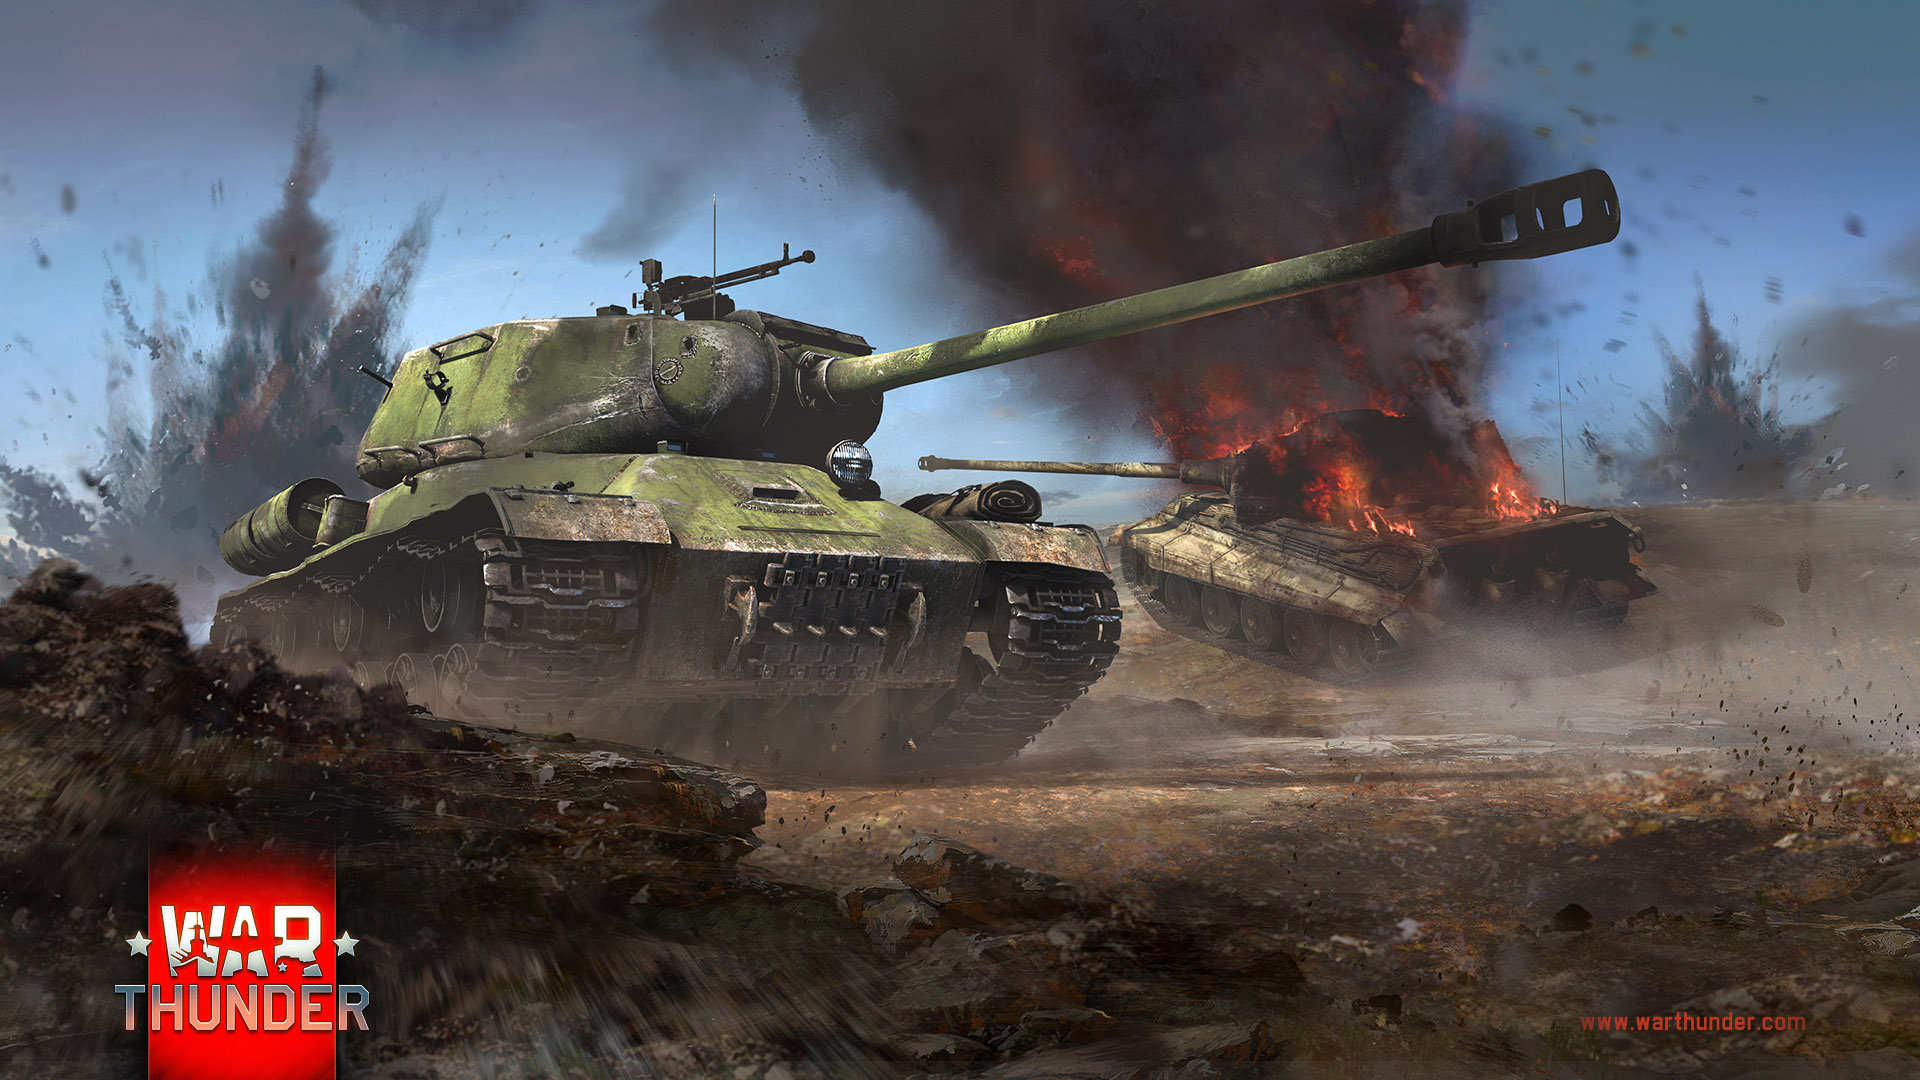 Battle Tanks Wallpaper